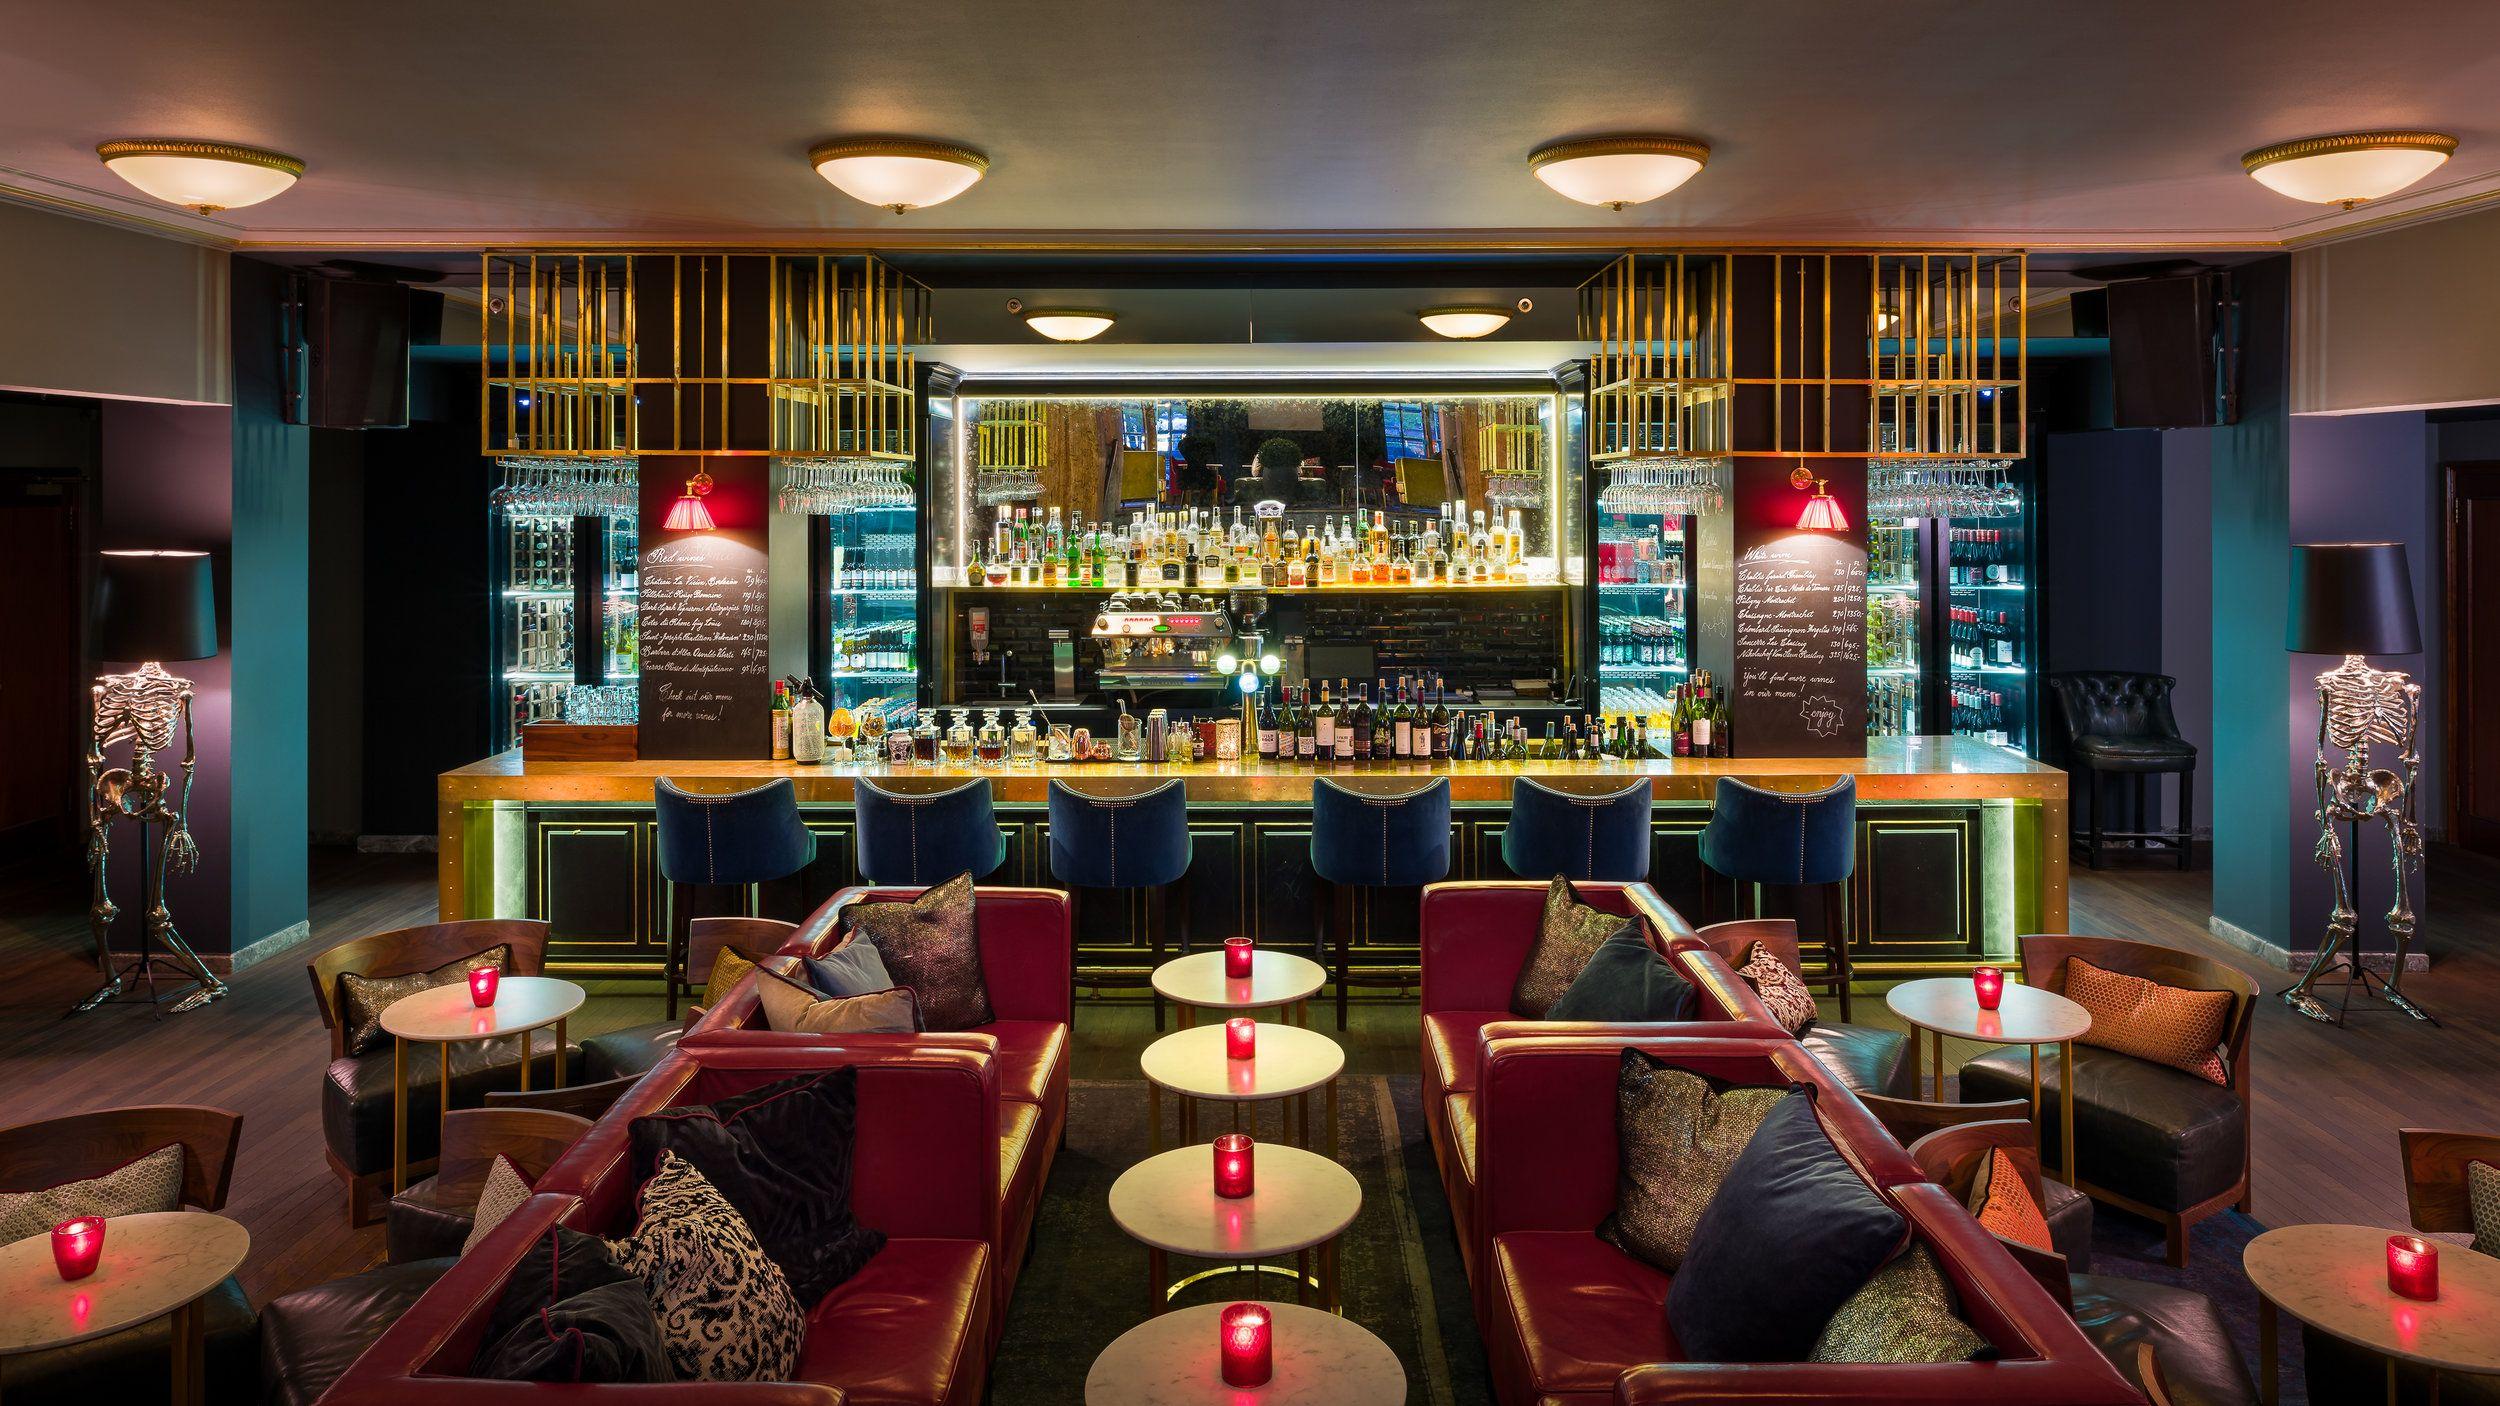 mid century modern restaurant in oslo rocks the best lighting designs